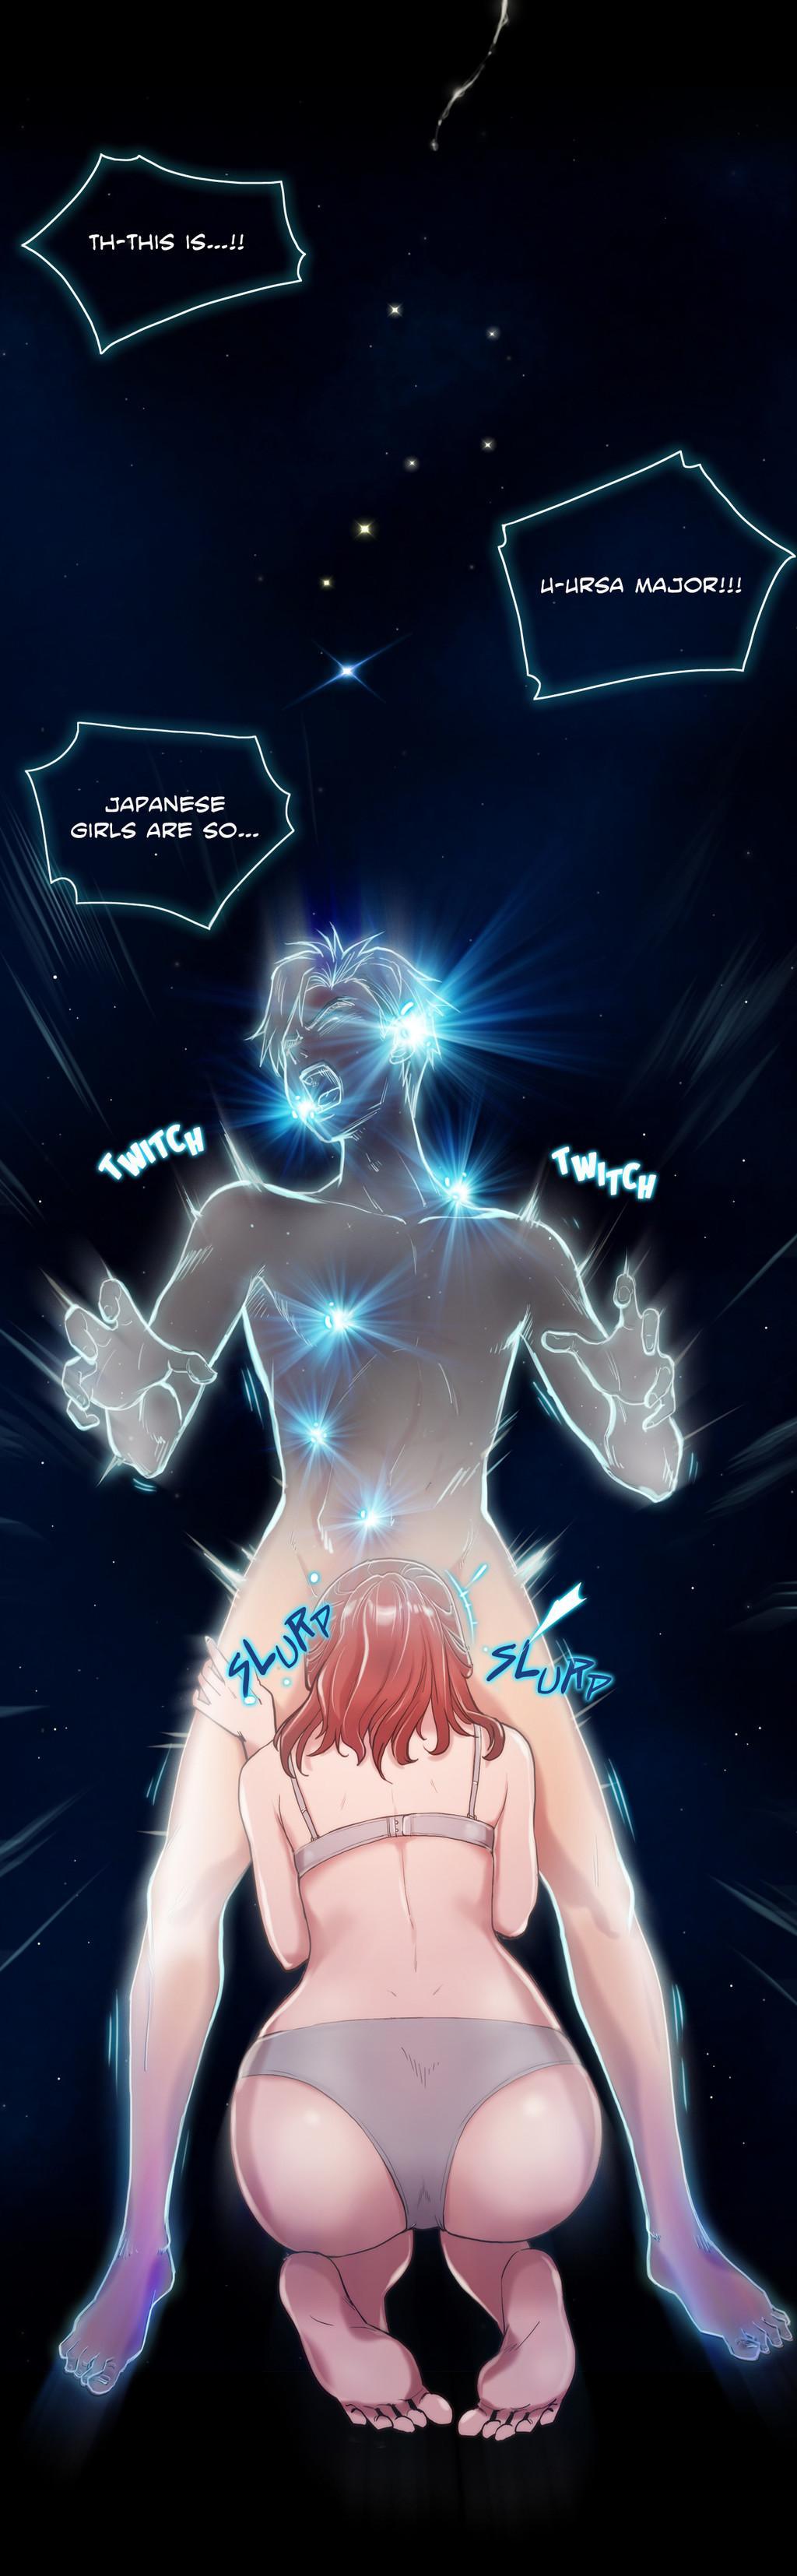 [BYMAN] Sex Knights-Erotic Sensuality & Perception Ch.1-13 (English) (Ongoing) 92